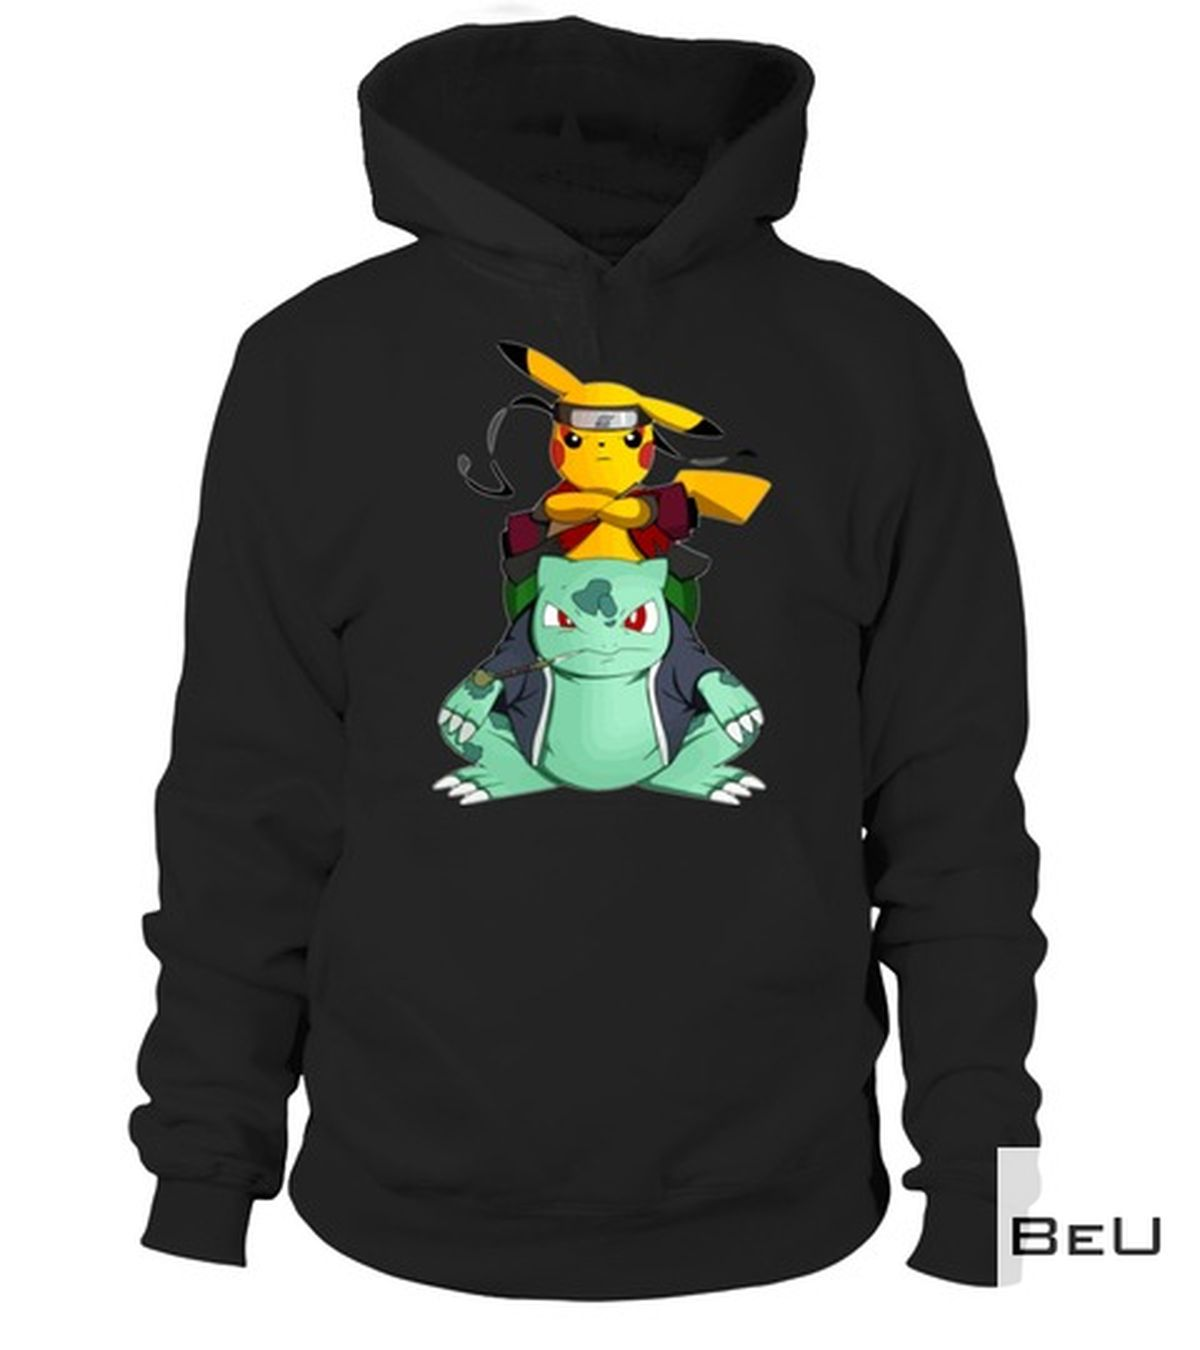 POD Pokemon Pikachu Sasuke Shirt, hoodie, tank top